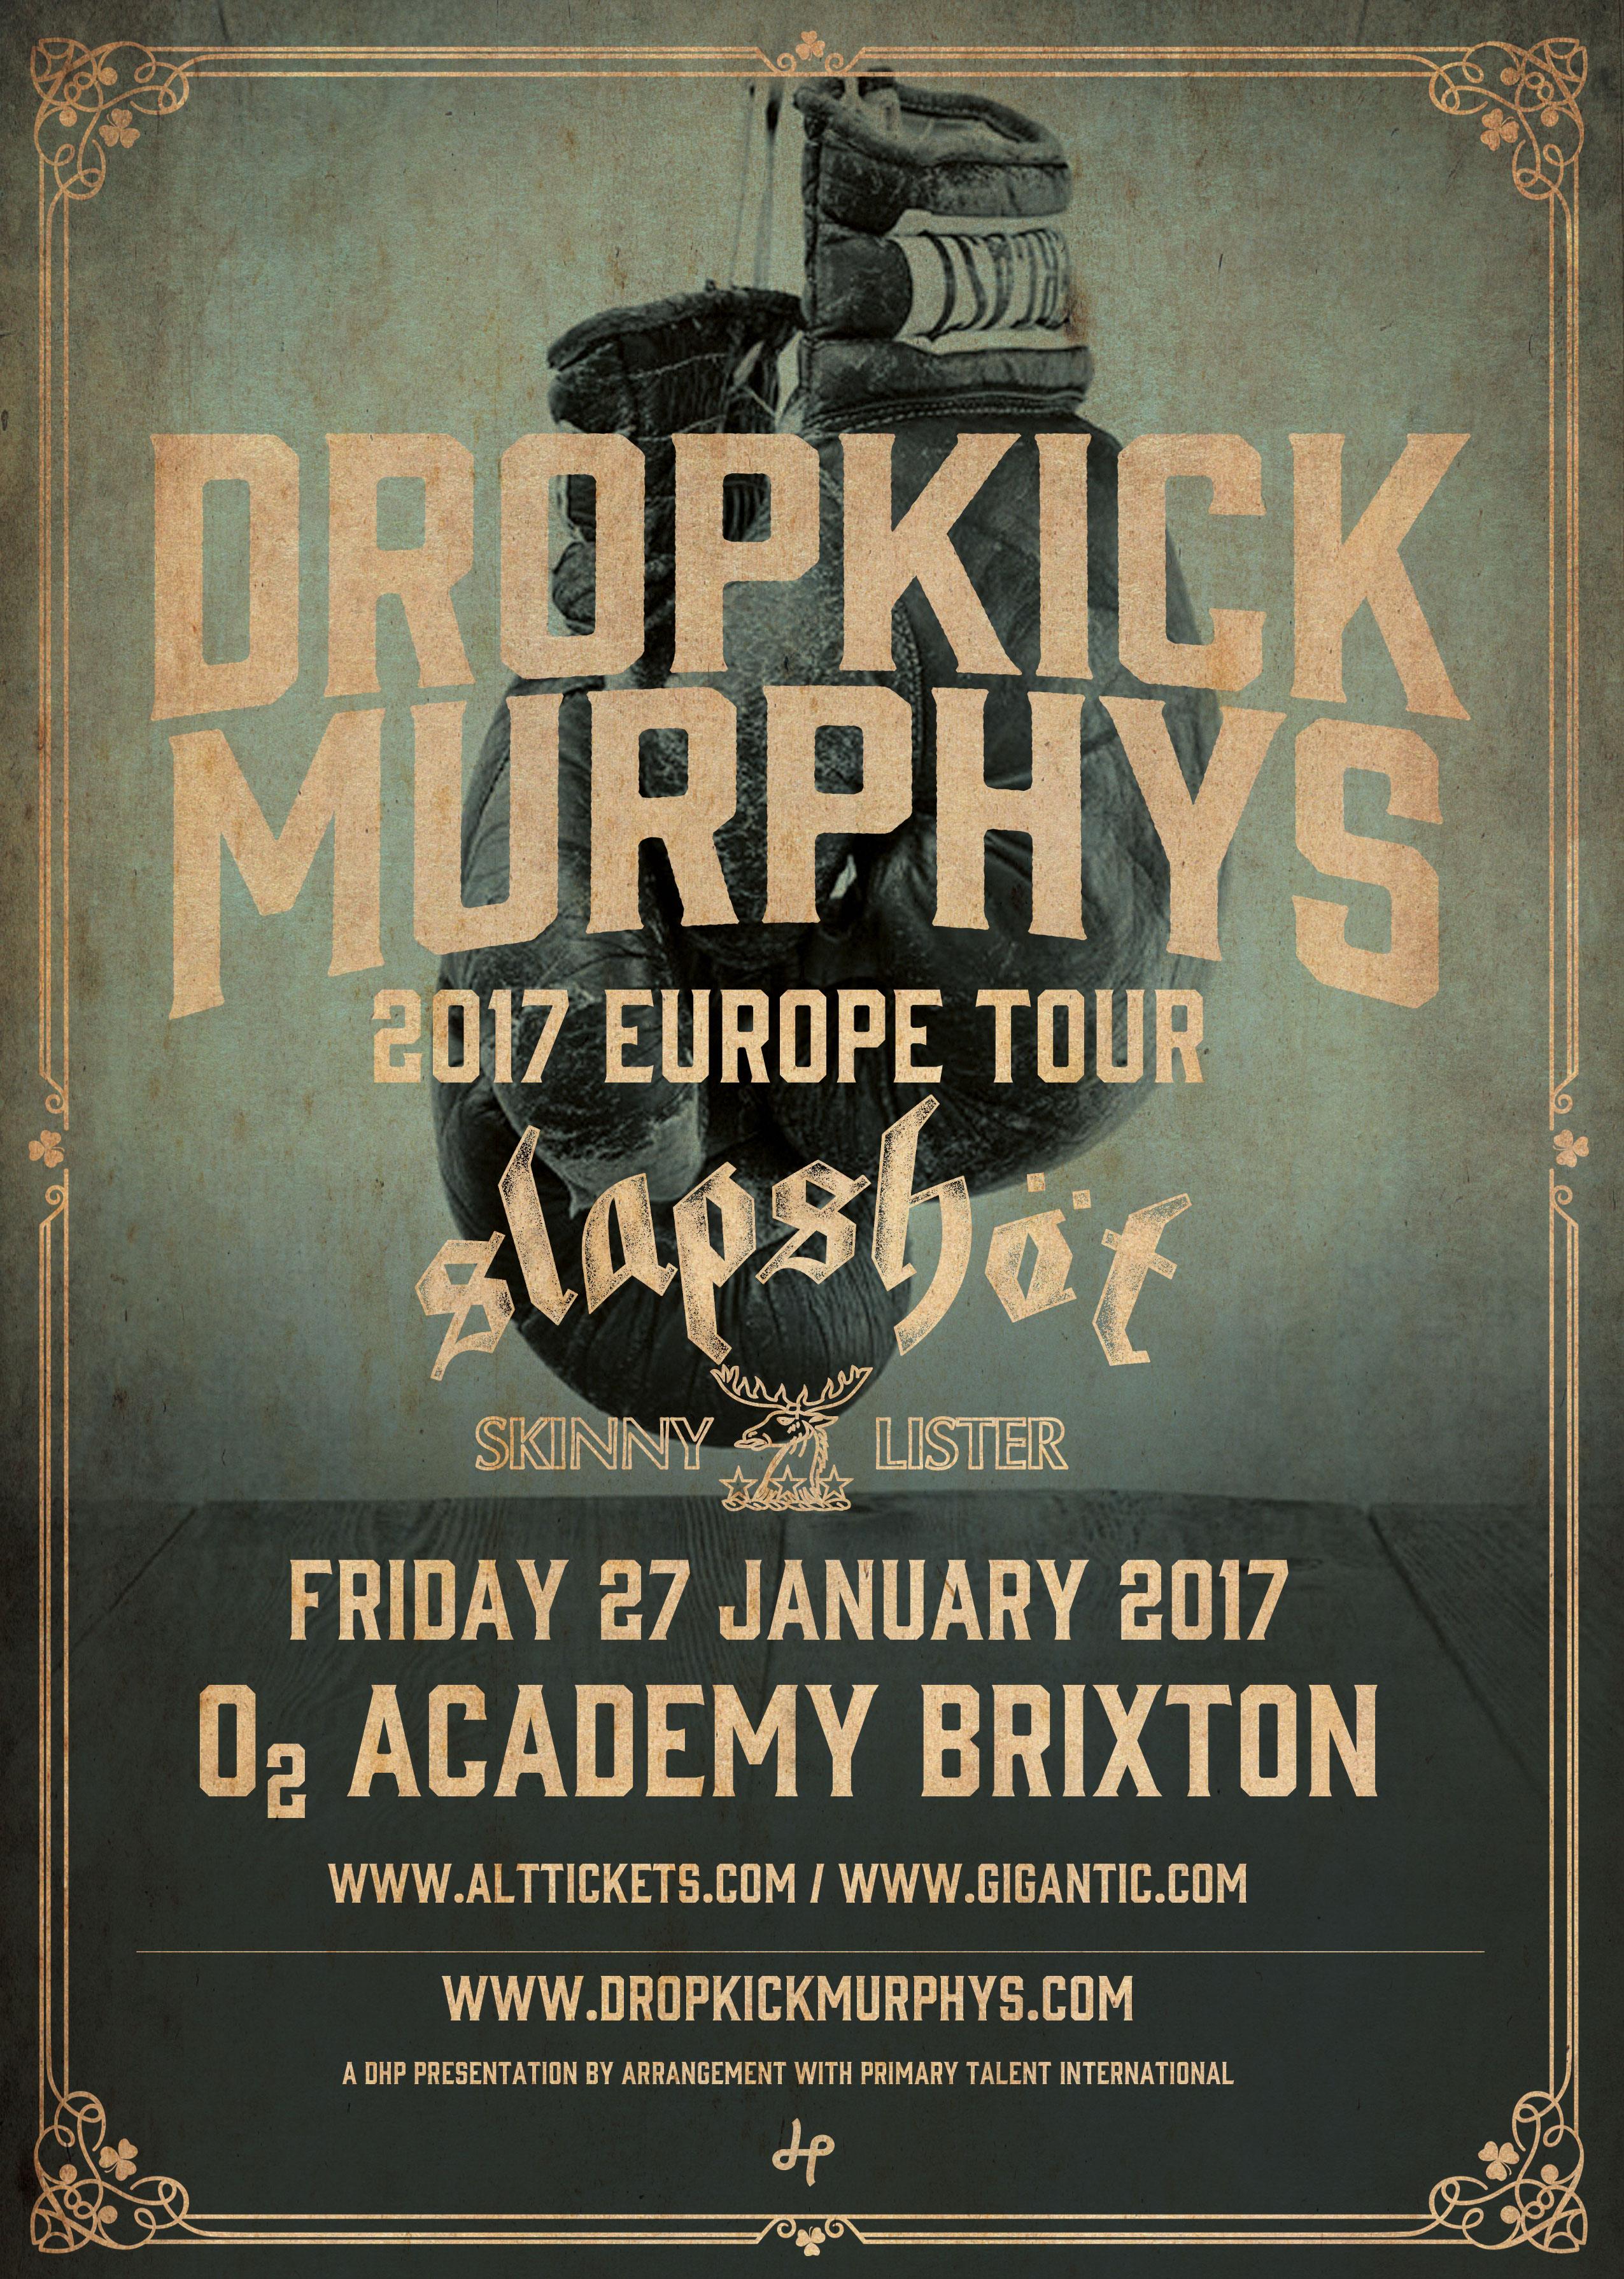 Dropkick Murphys News